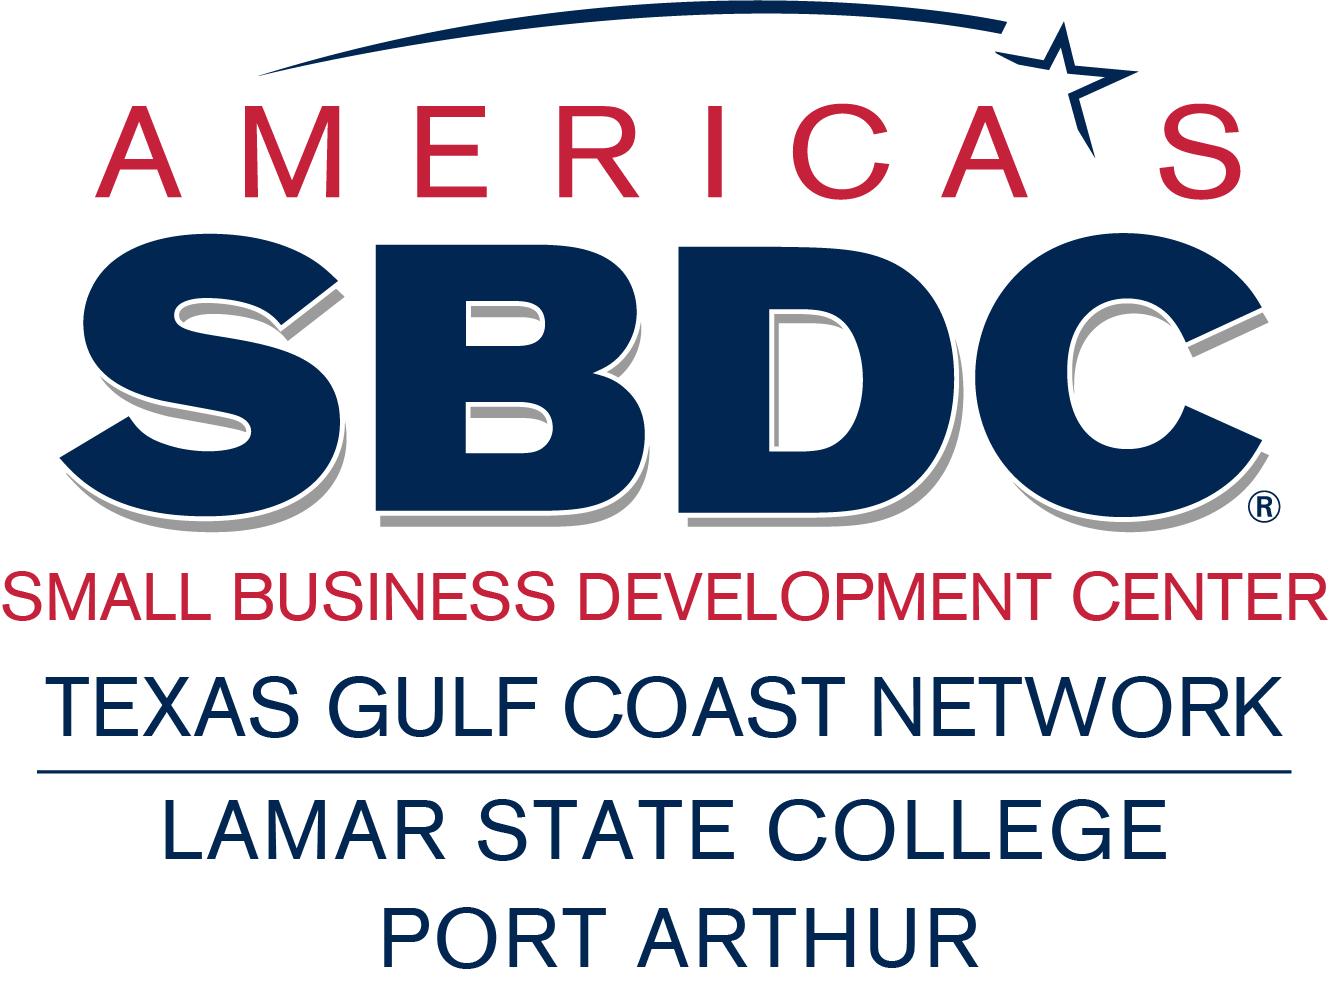 Lamar State College Port Arthur Offering Small Business Development Webinars